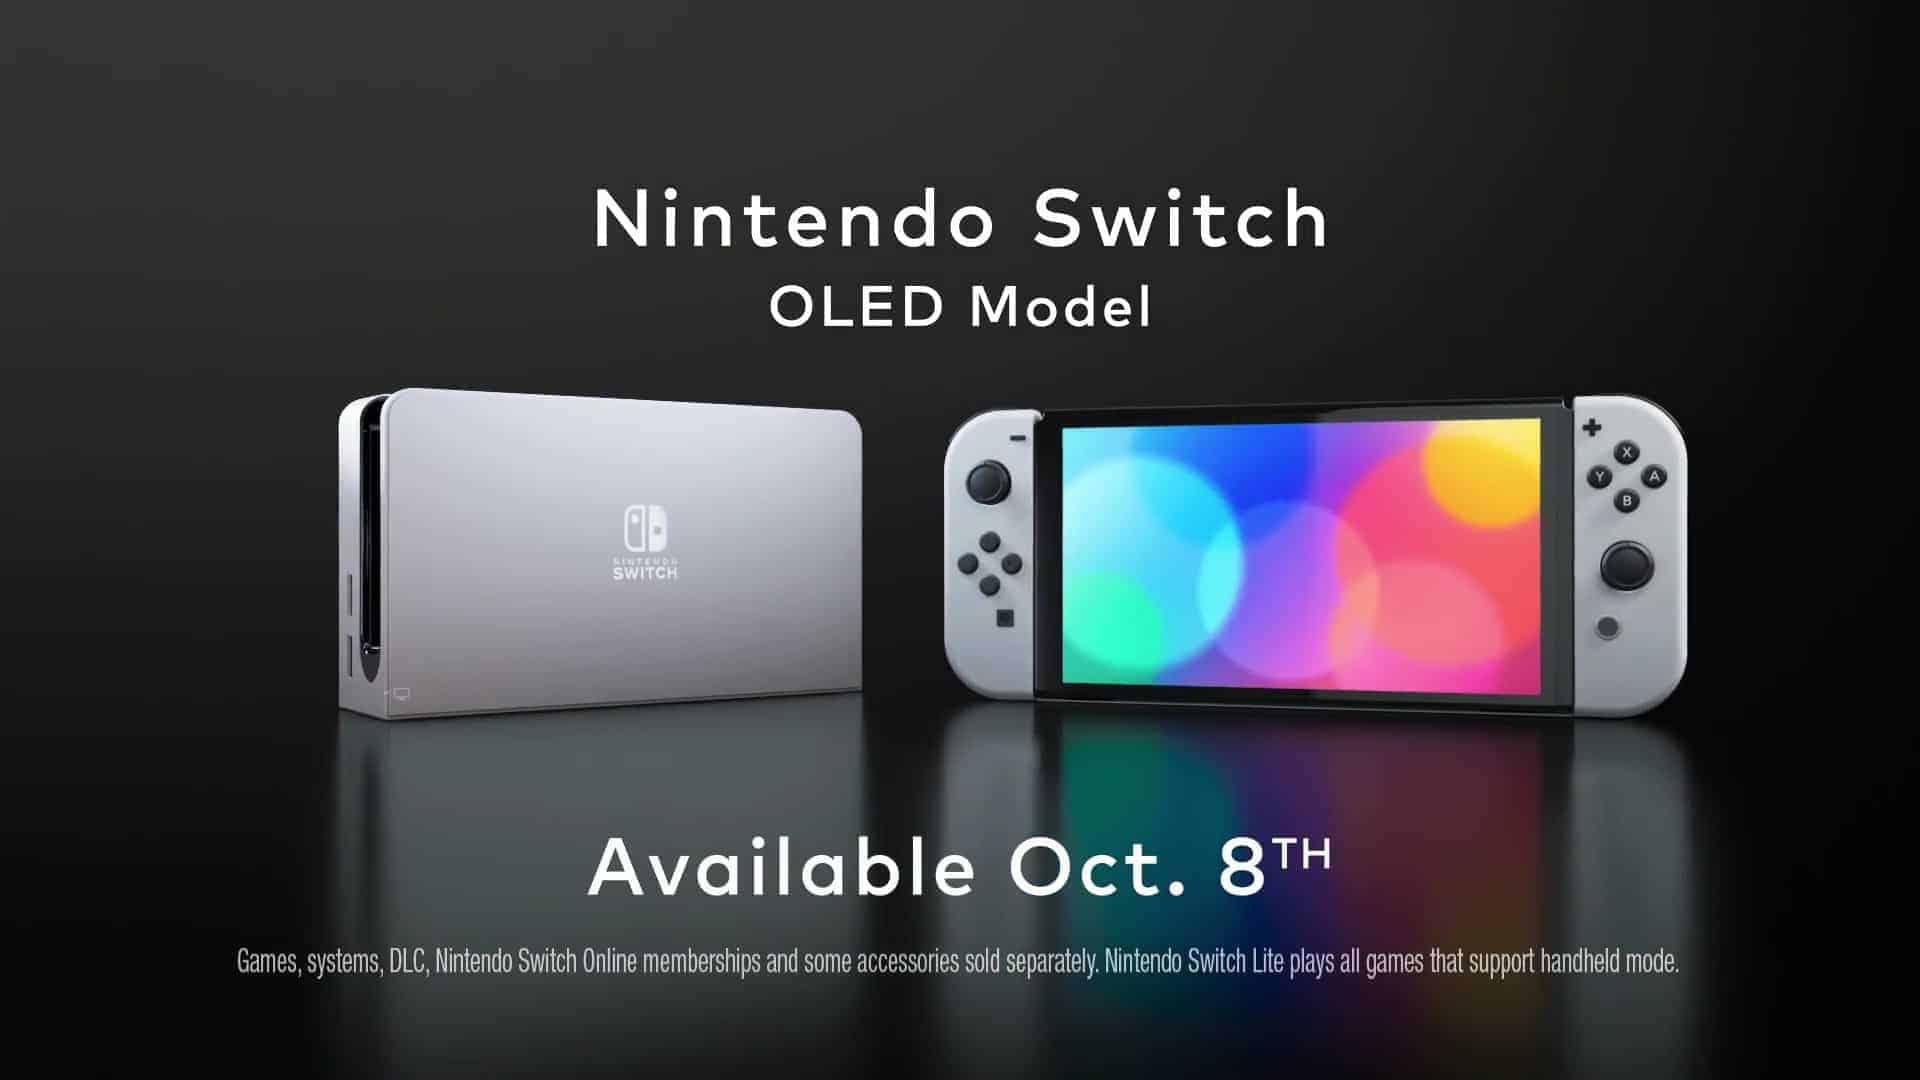 OLED 탑재! 배젤줄여 화면 크기 늘여...신형 닌텐도 스위치 10월 8일 출시